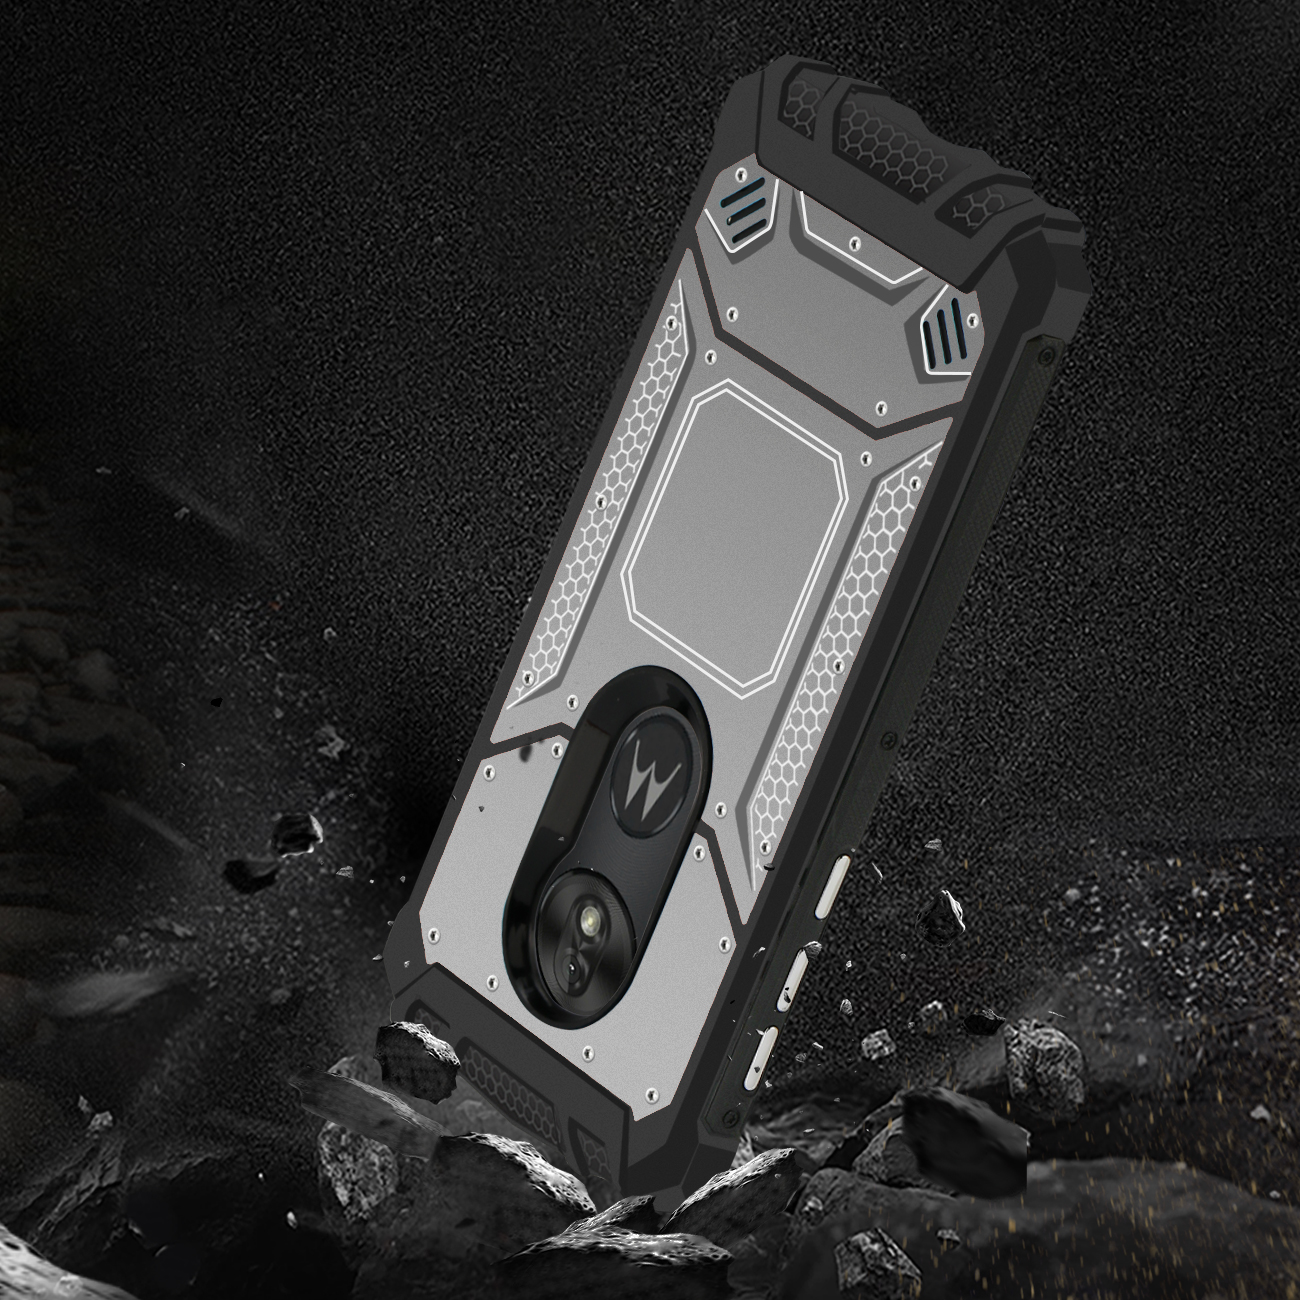 MOTOROLA MOTO G7 PLAY_Metallic Front Cover Case In_Gray